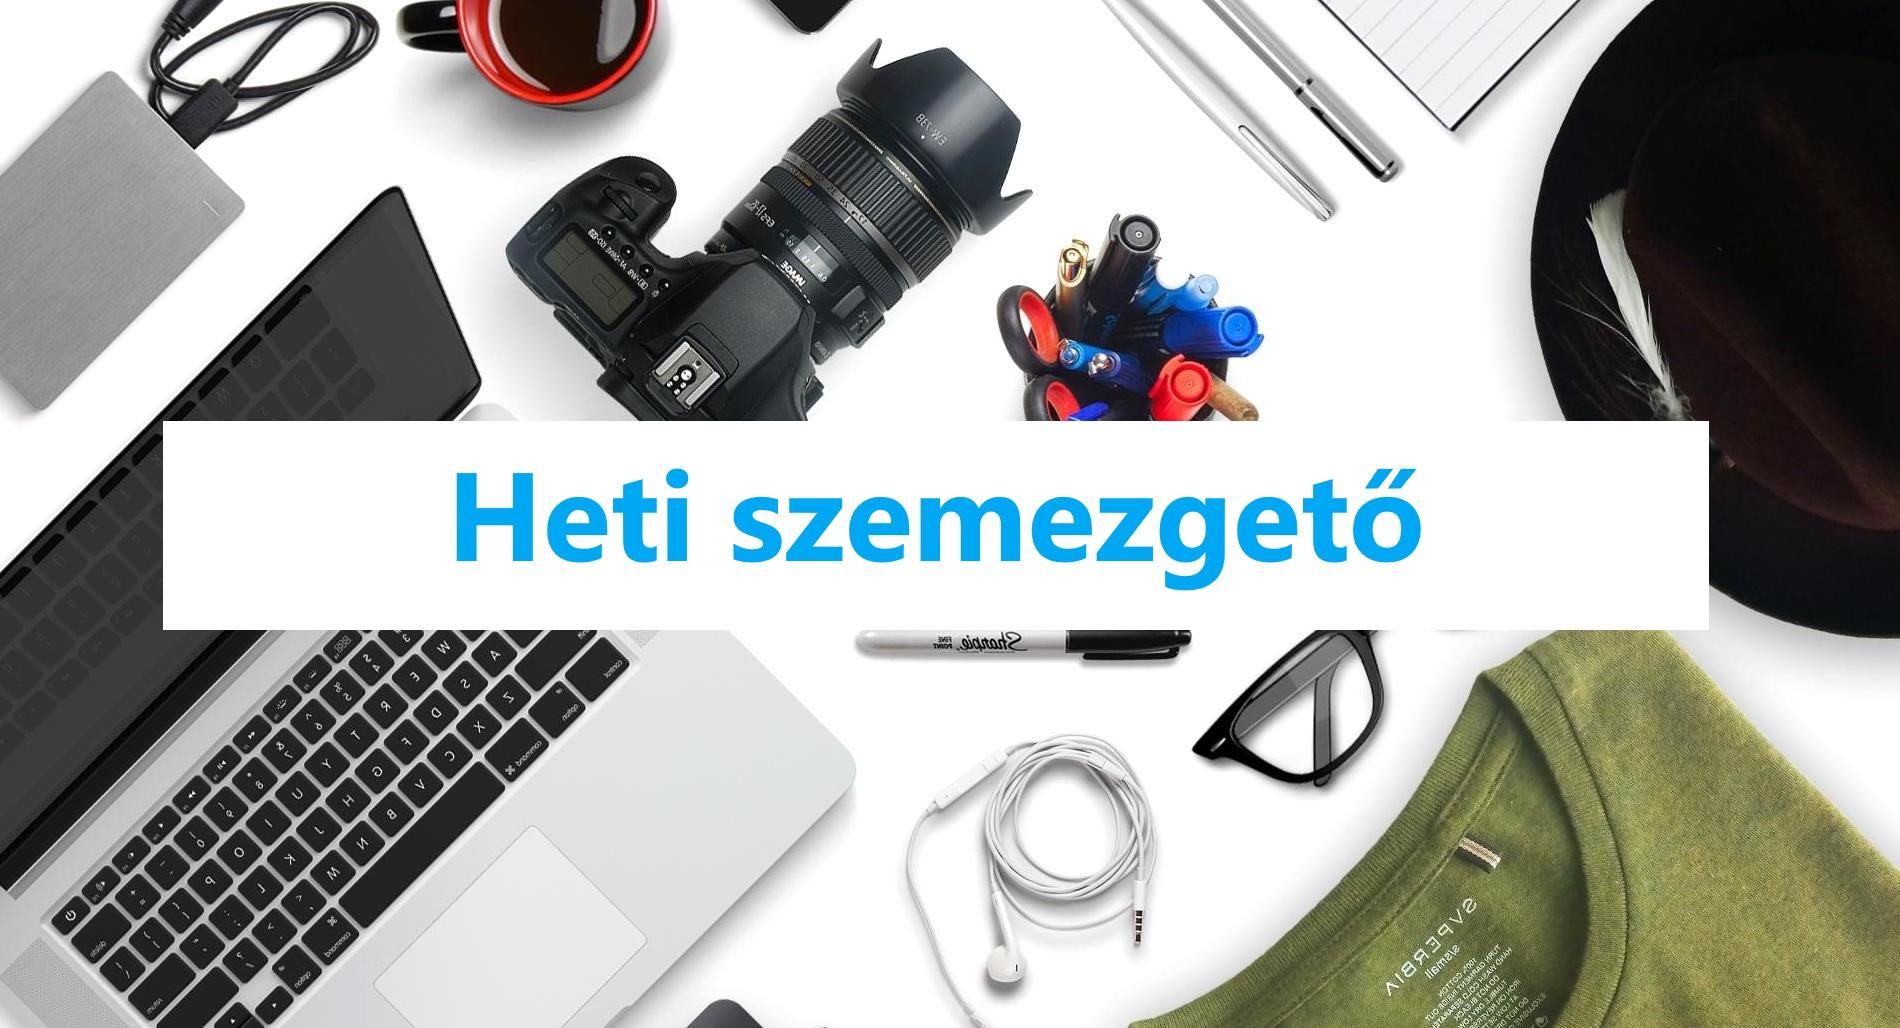 heti_szemezgeto_uj_27.jpg